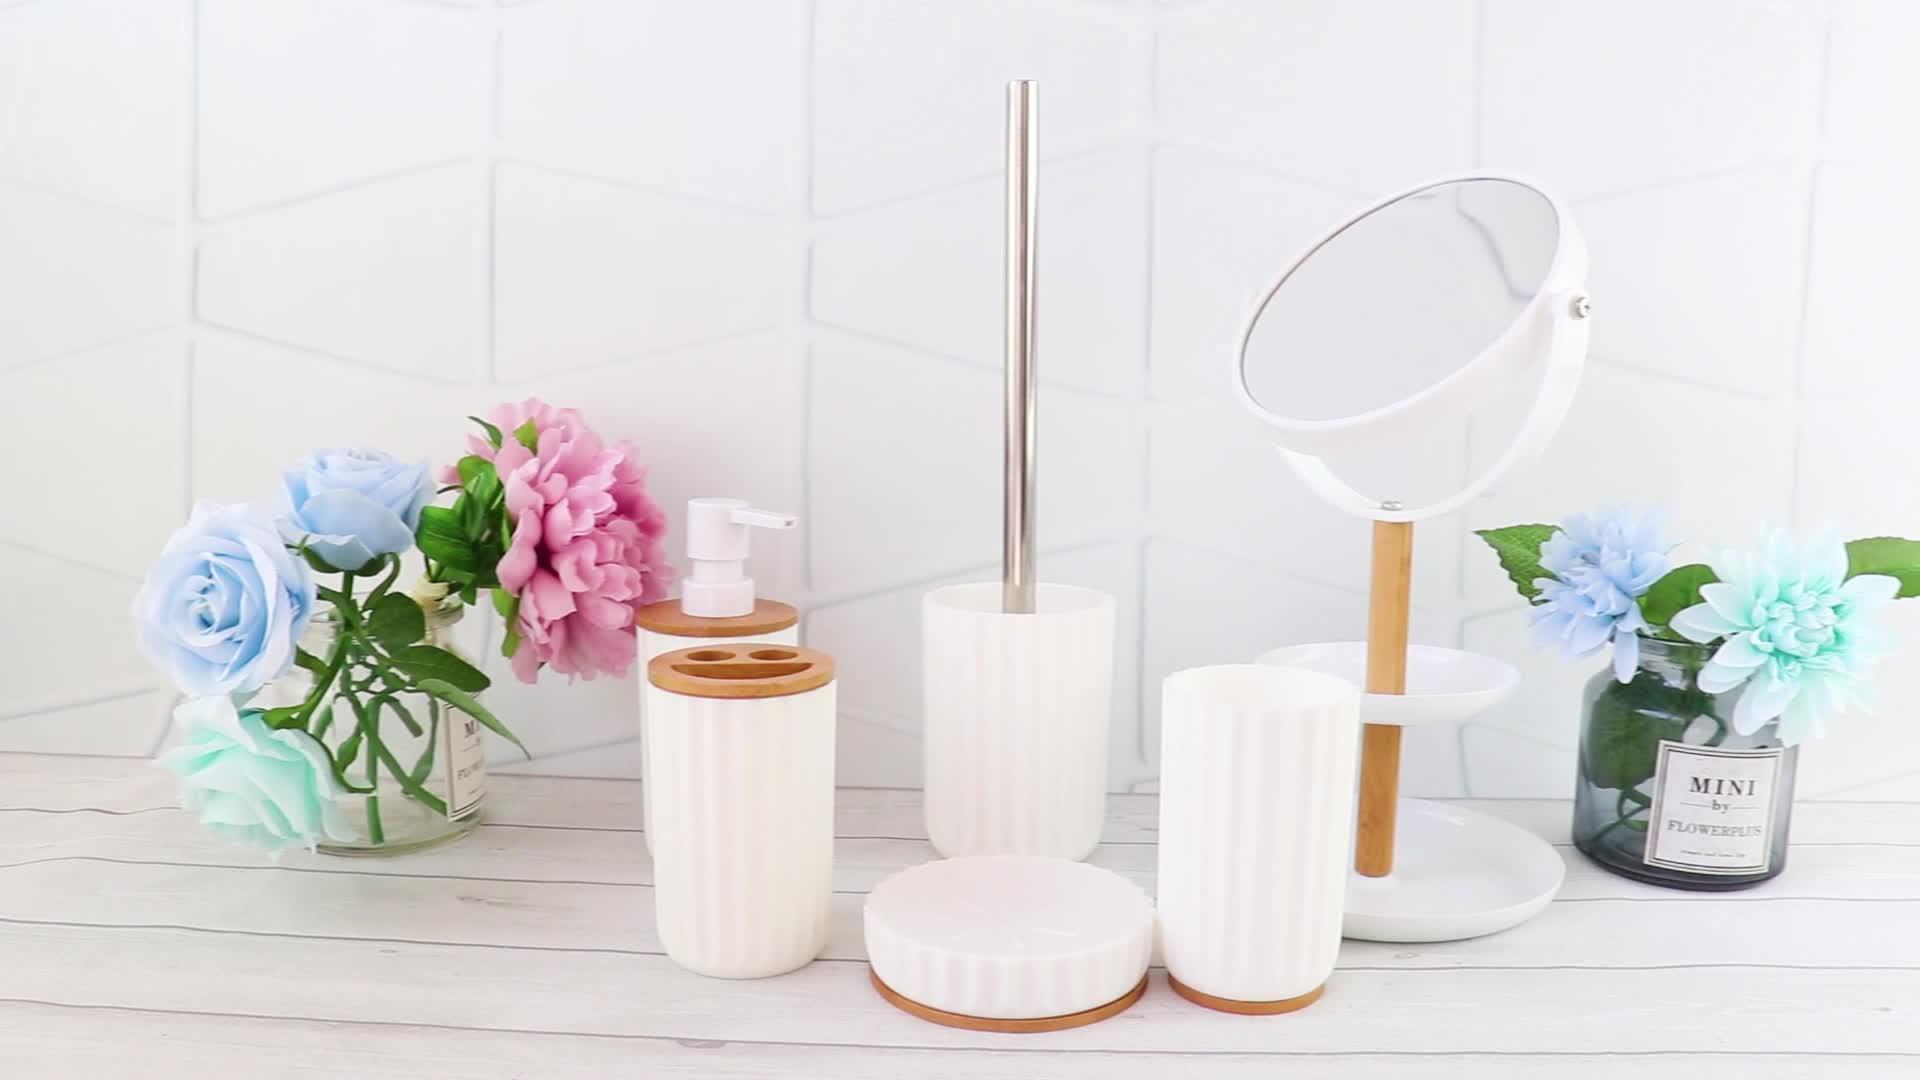 Os acessórios de banho de plástico branco do agregado